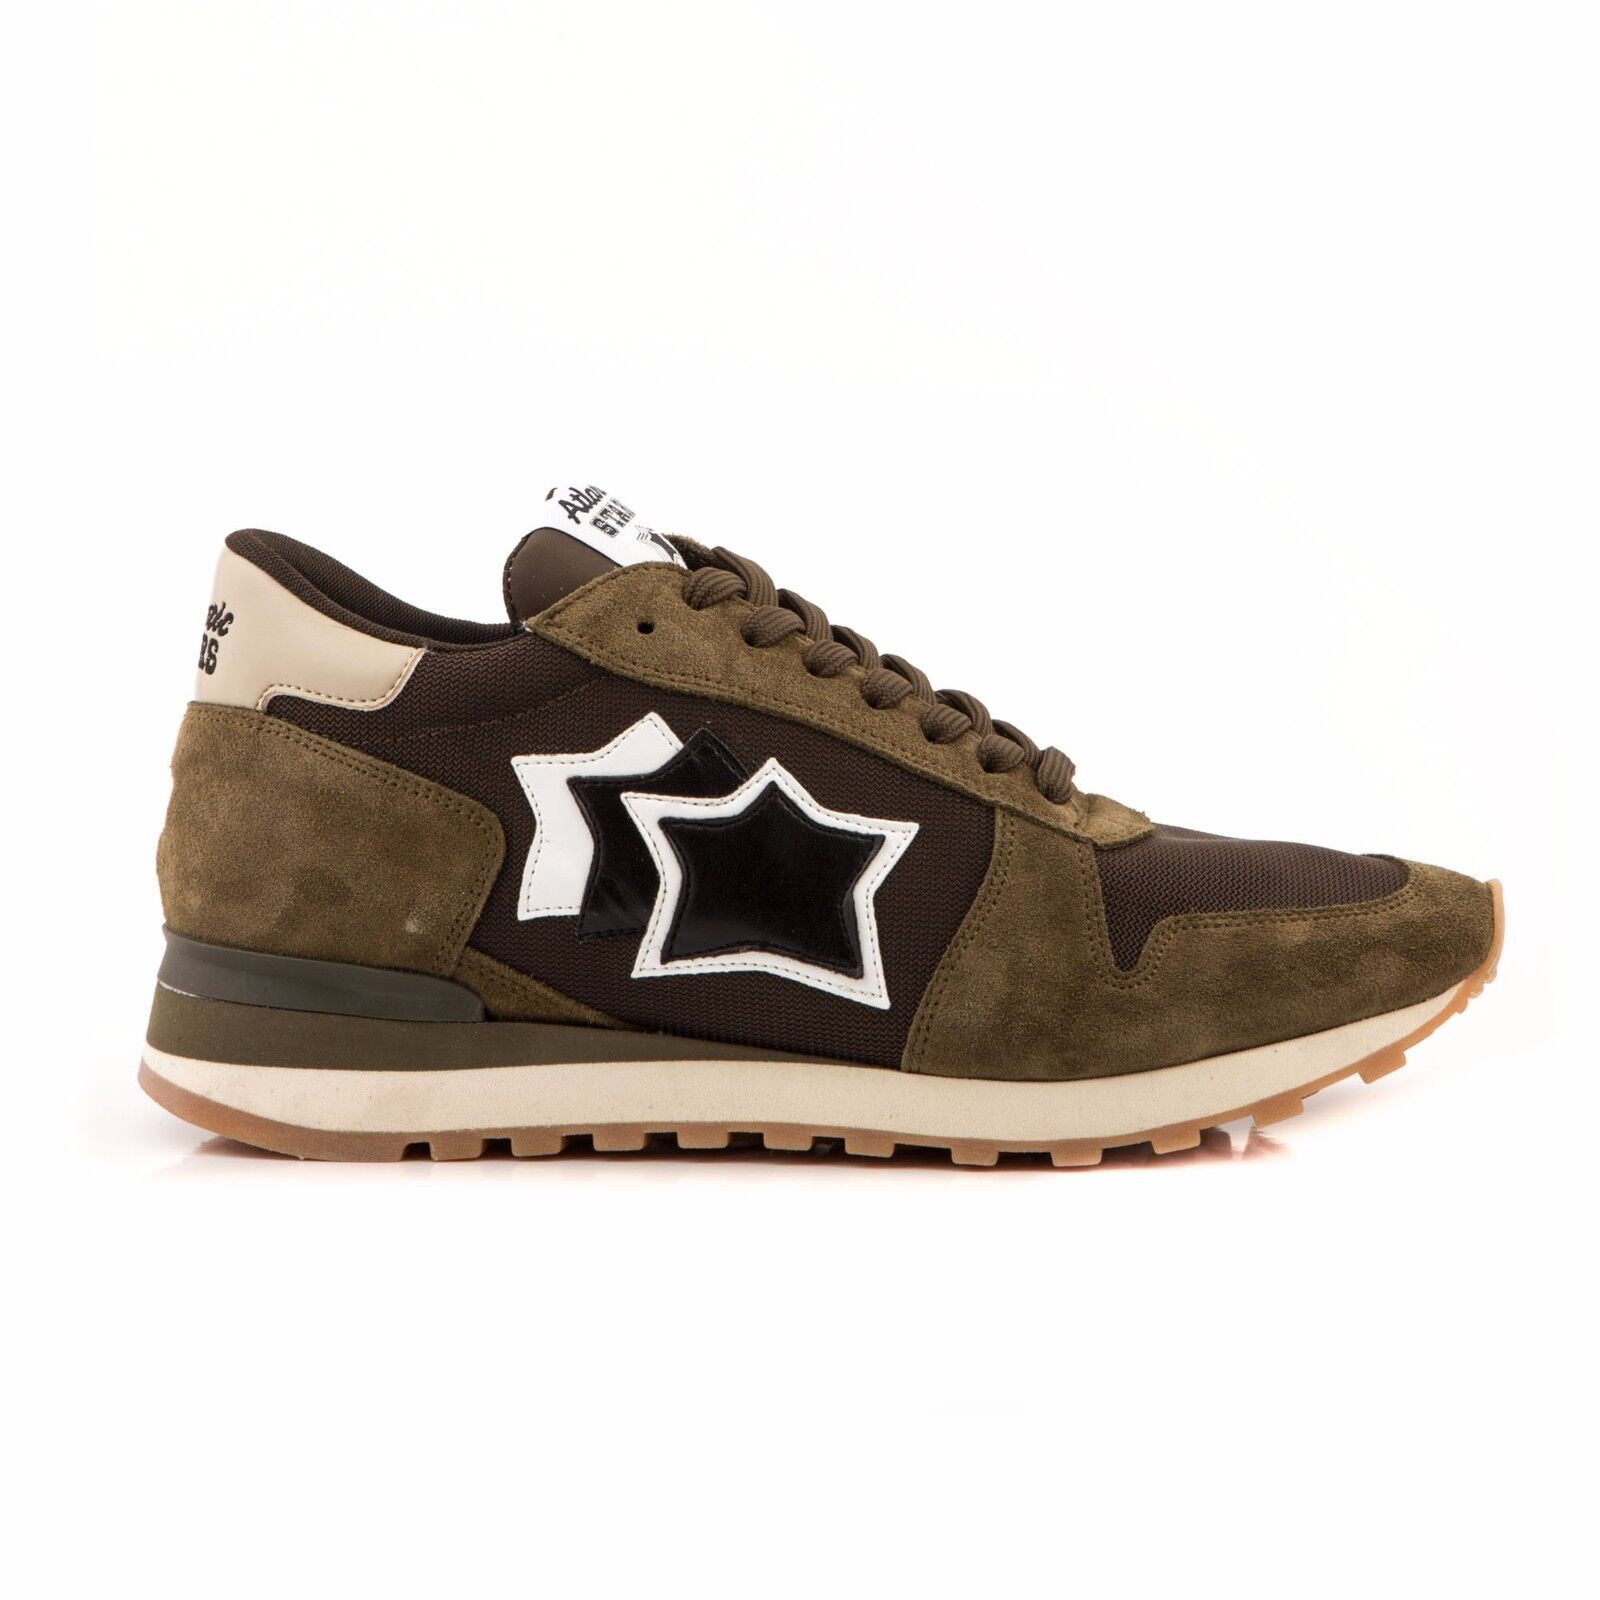 zapatos ATLANTIC STARS hombres ARGO MMNY ABDN AUTUNNO 2017 18 LISTINO  verde